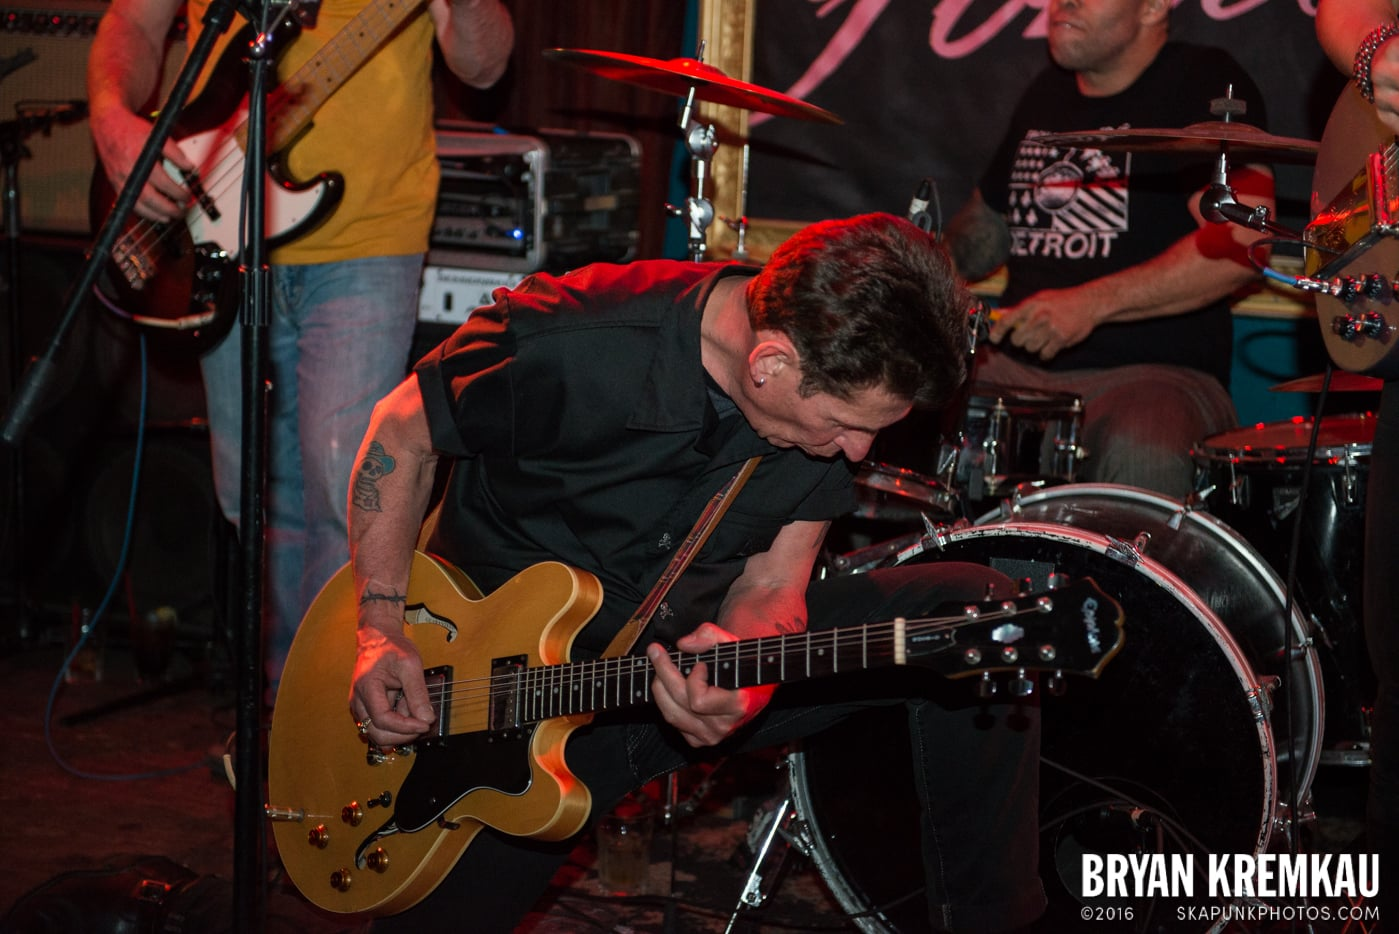 Roddy Radiation & The Scotch Bonnets @ Fontana's, NYC - 4.25.15 (19)